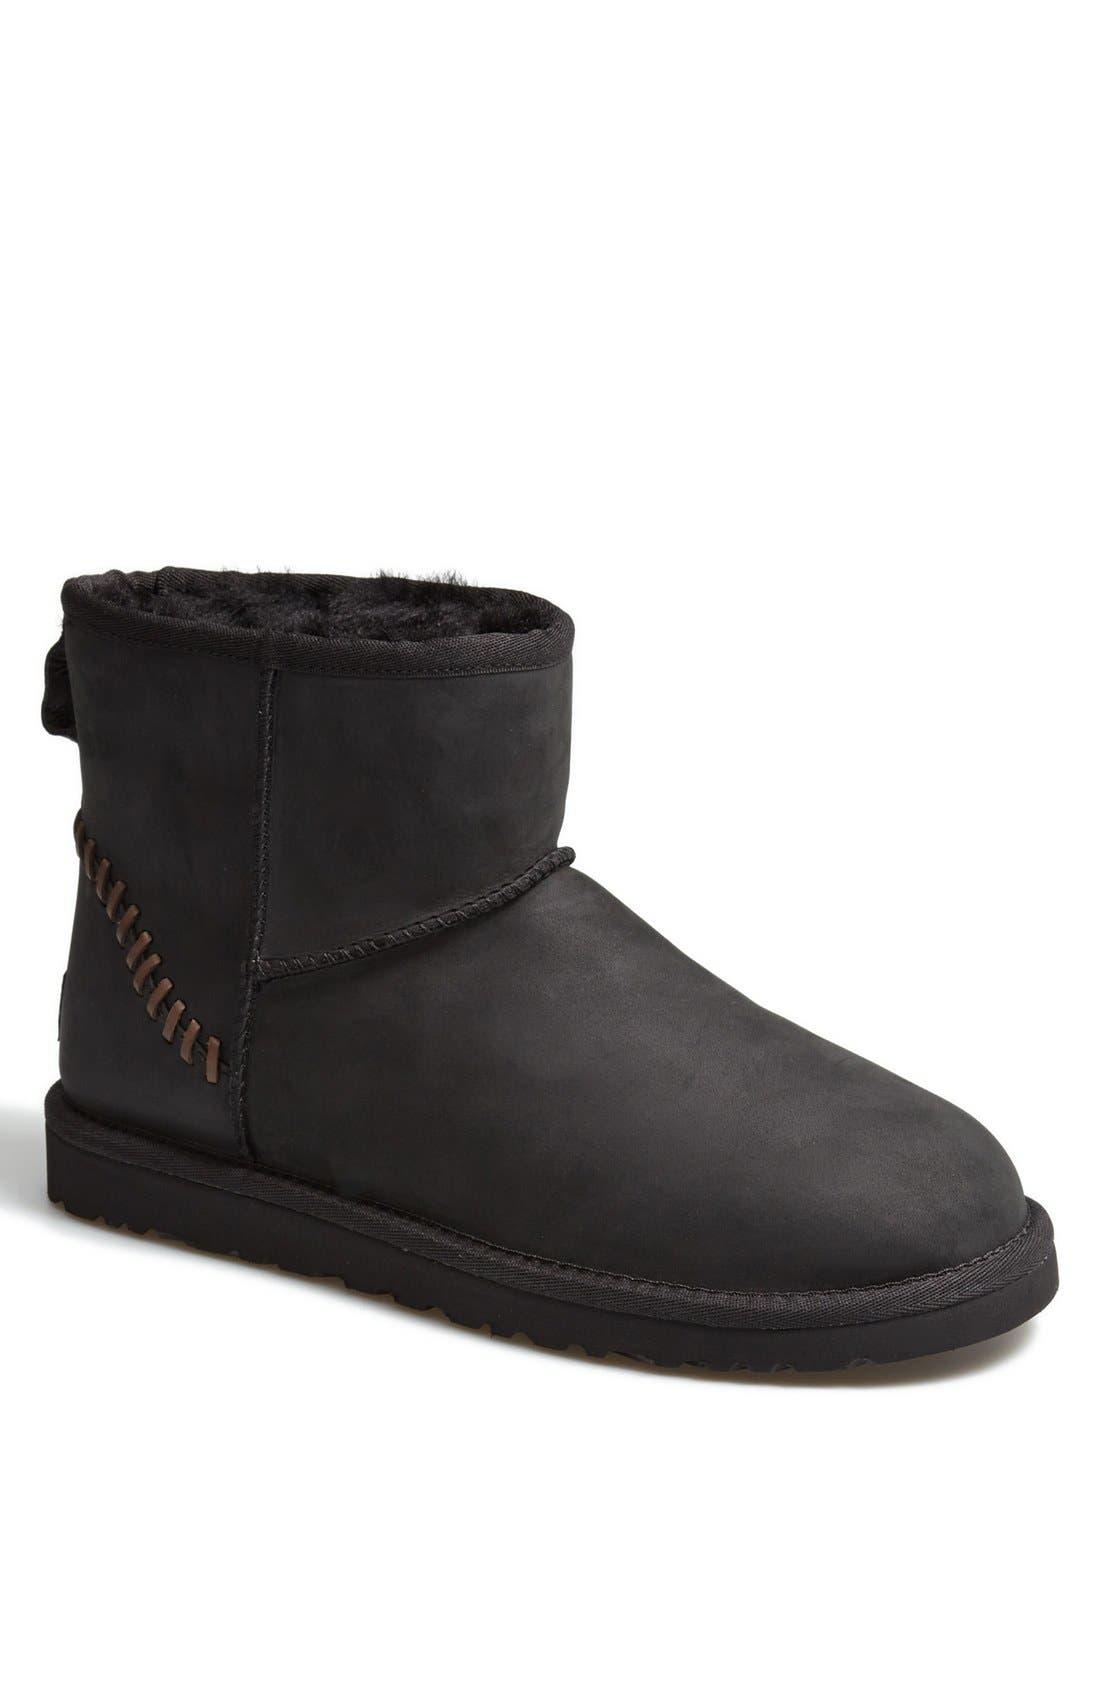 Alternate Image 1 Selected - UGG® 'Classic Mini Deco' Boot (Men)